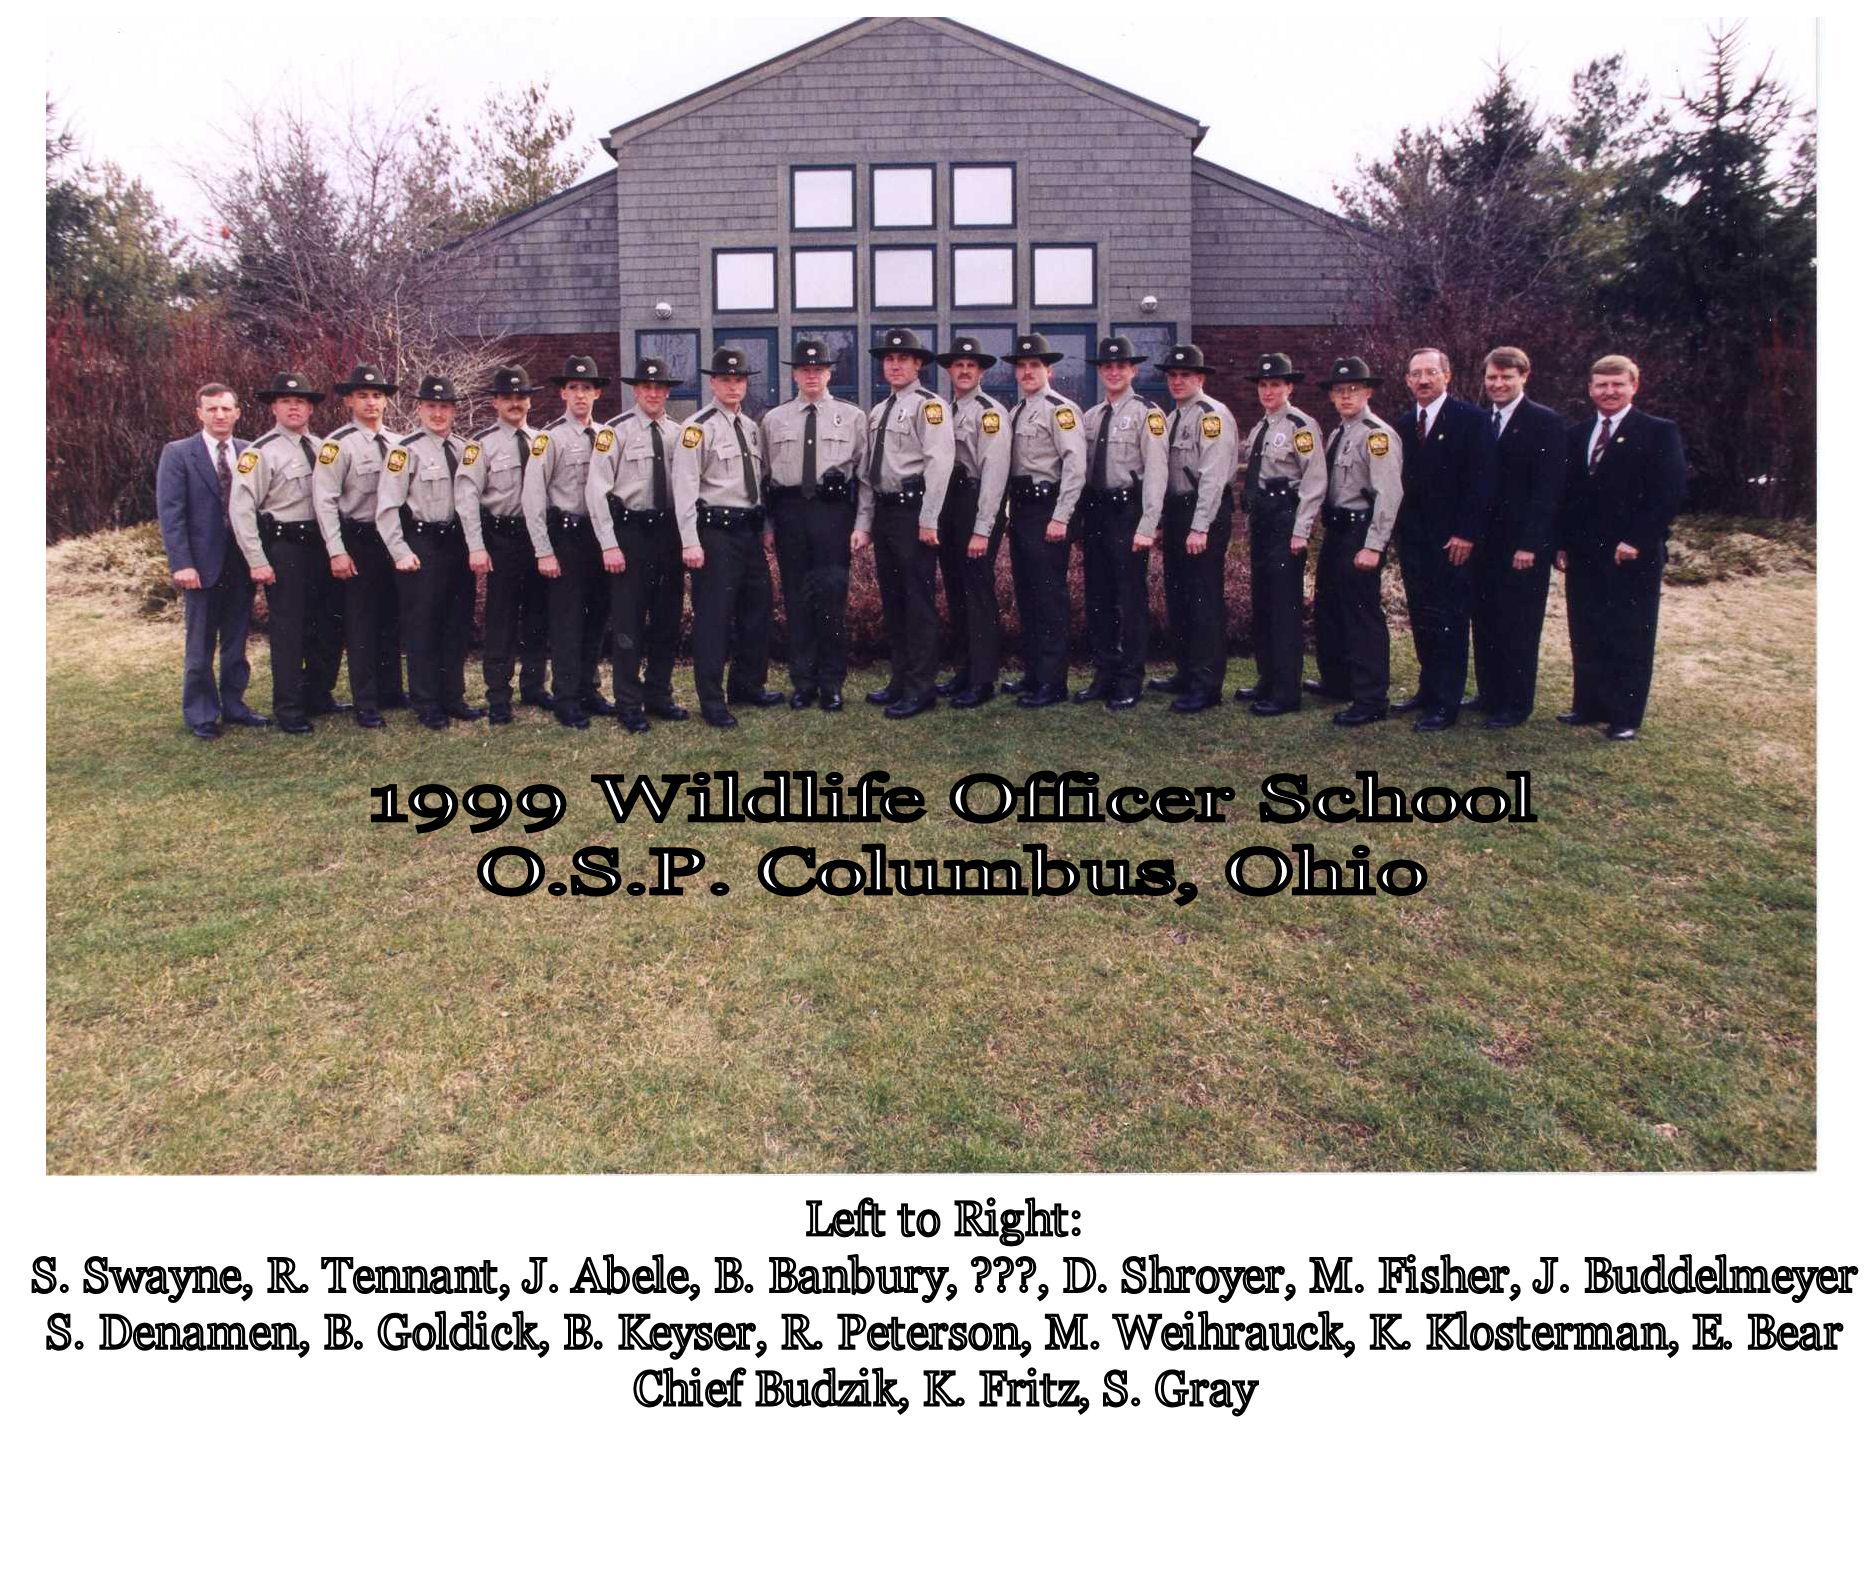 1999 Cadet OSP